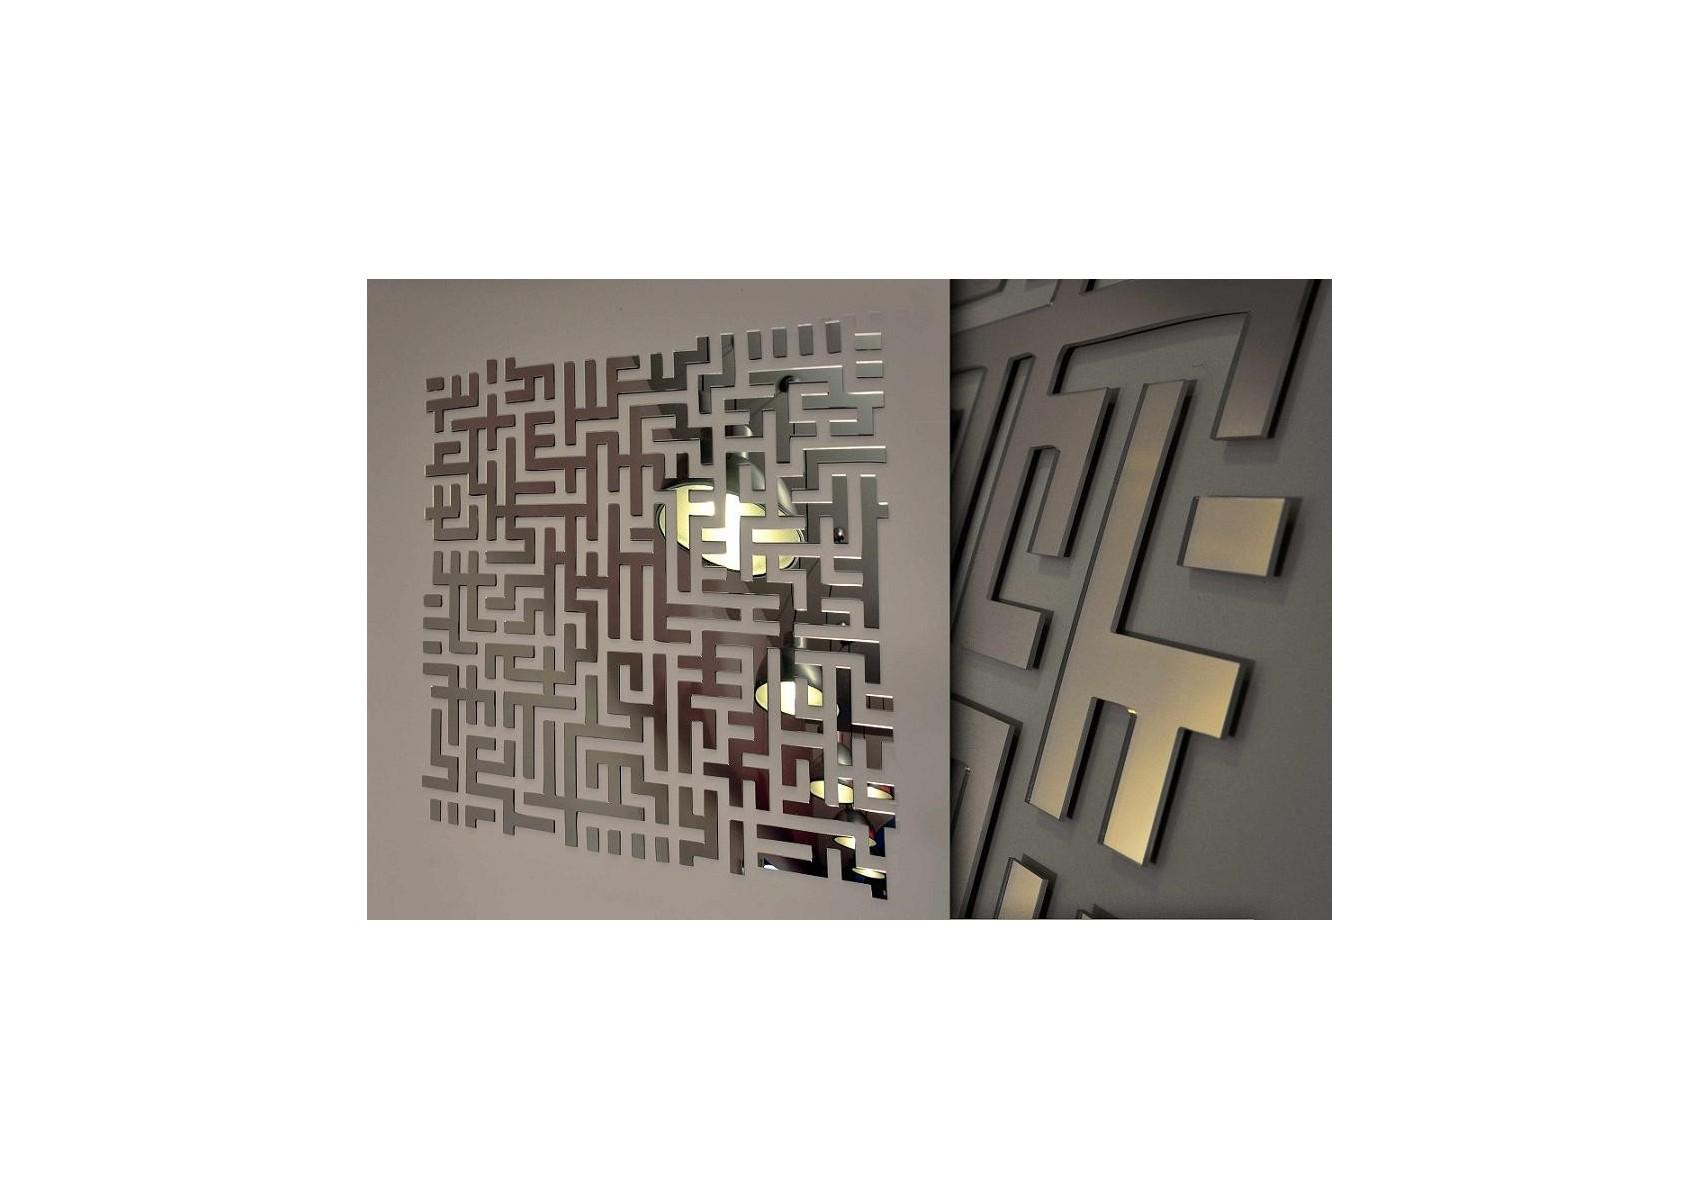 Miroir design et origibal- Lost